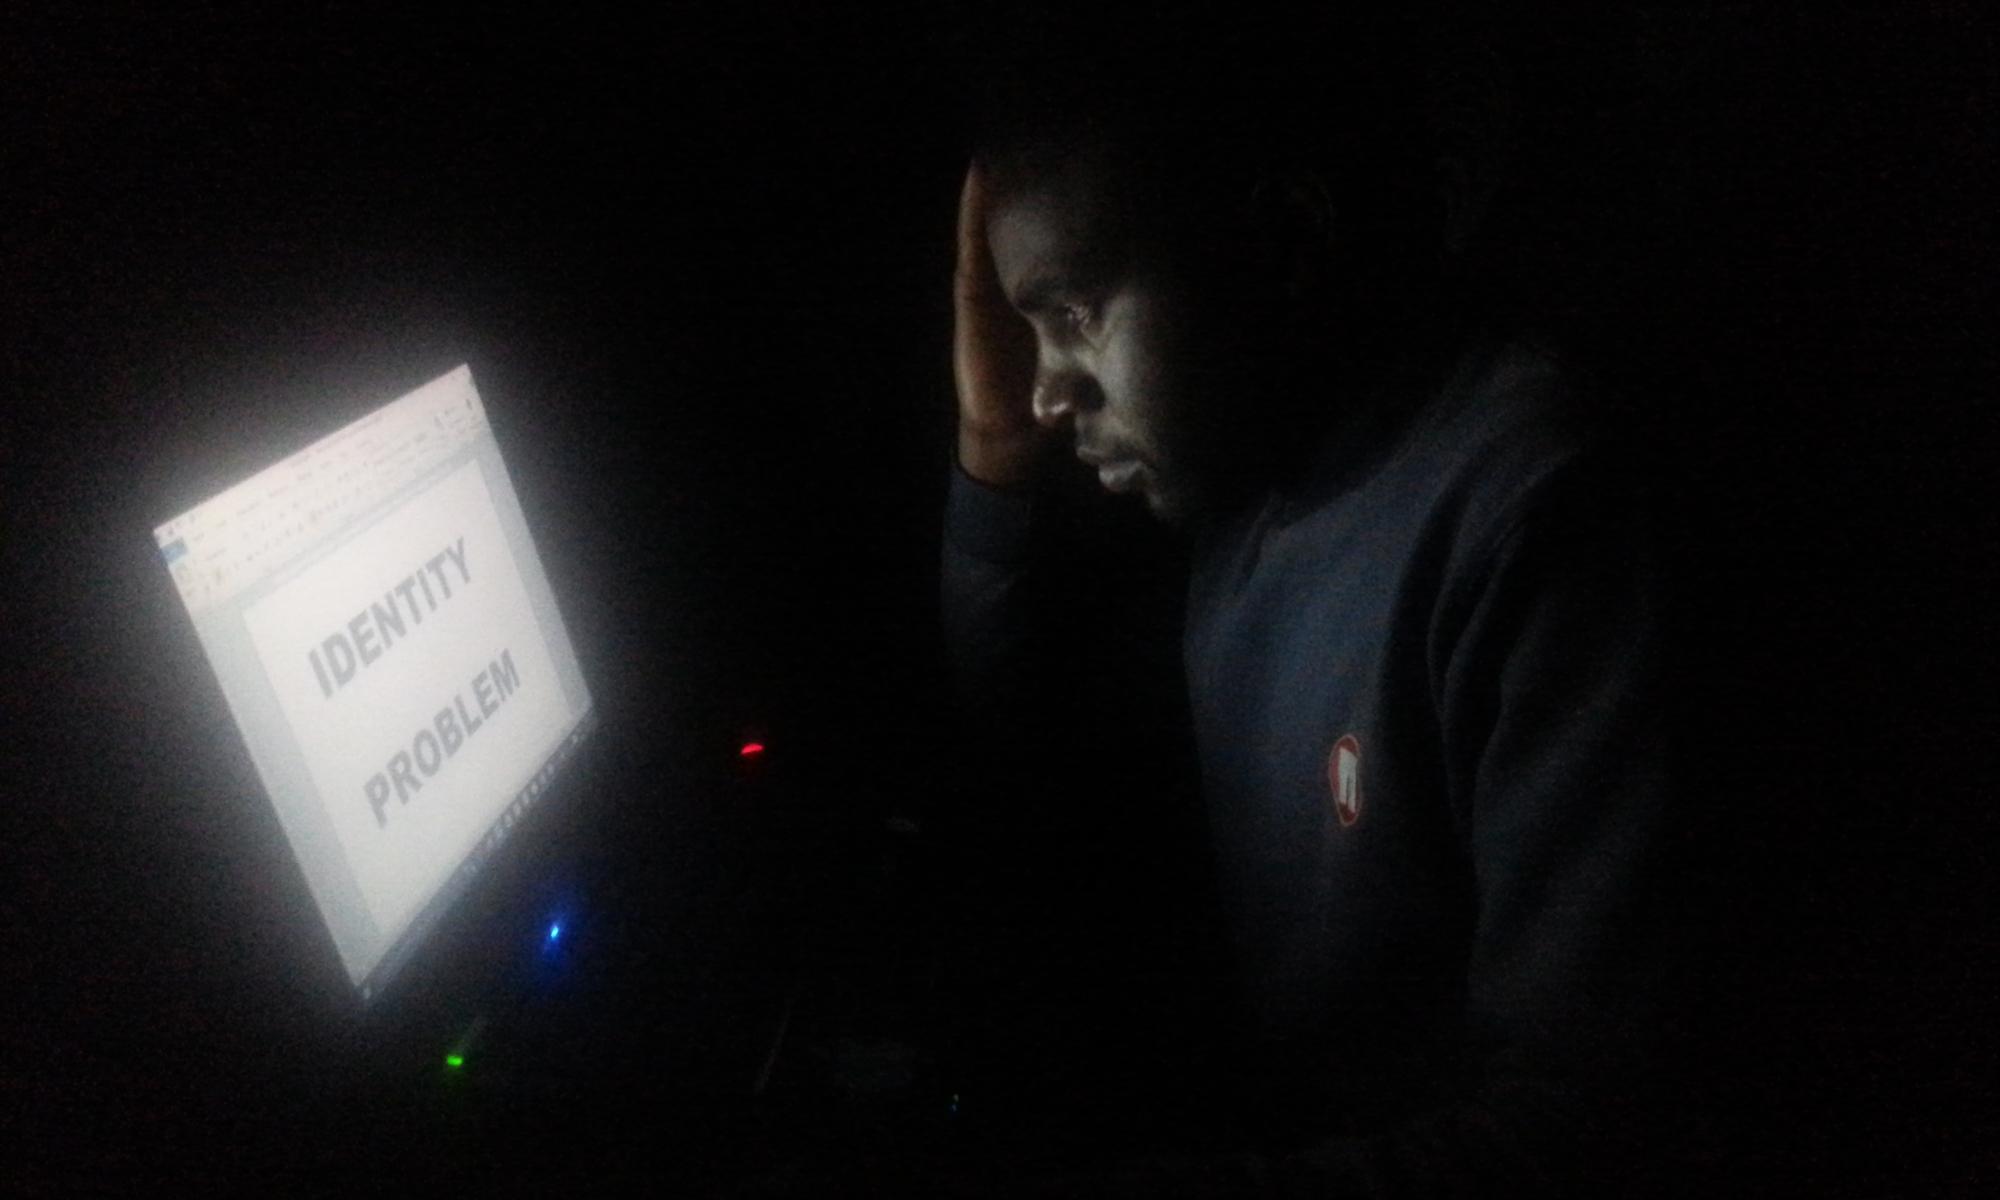 I Was Denied My Cameroonian Nationality Despite Glaring Evidence